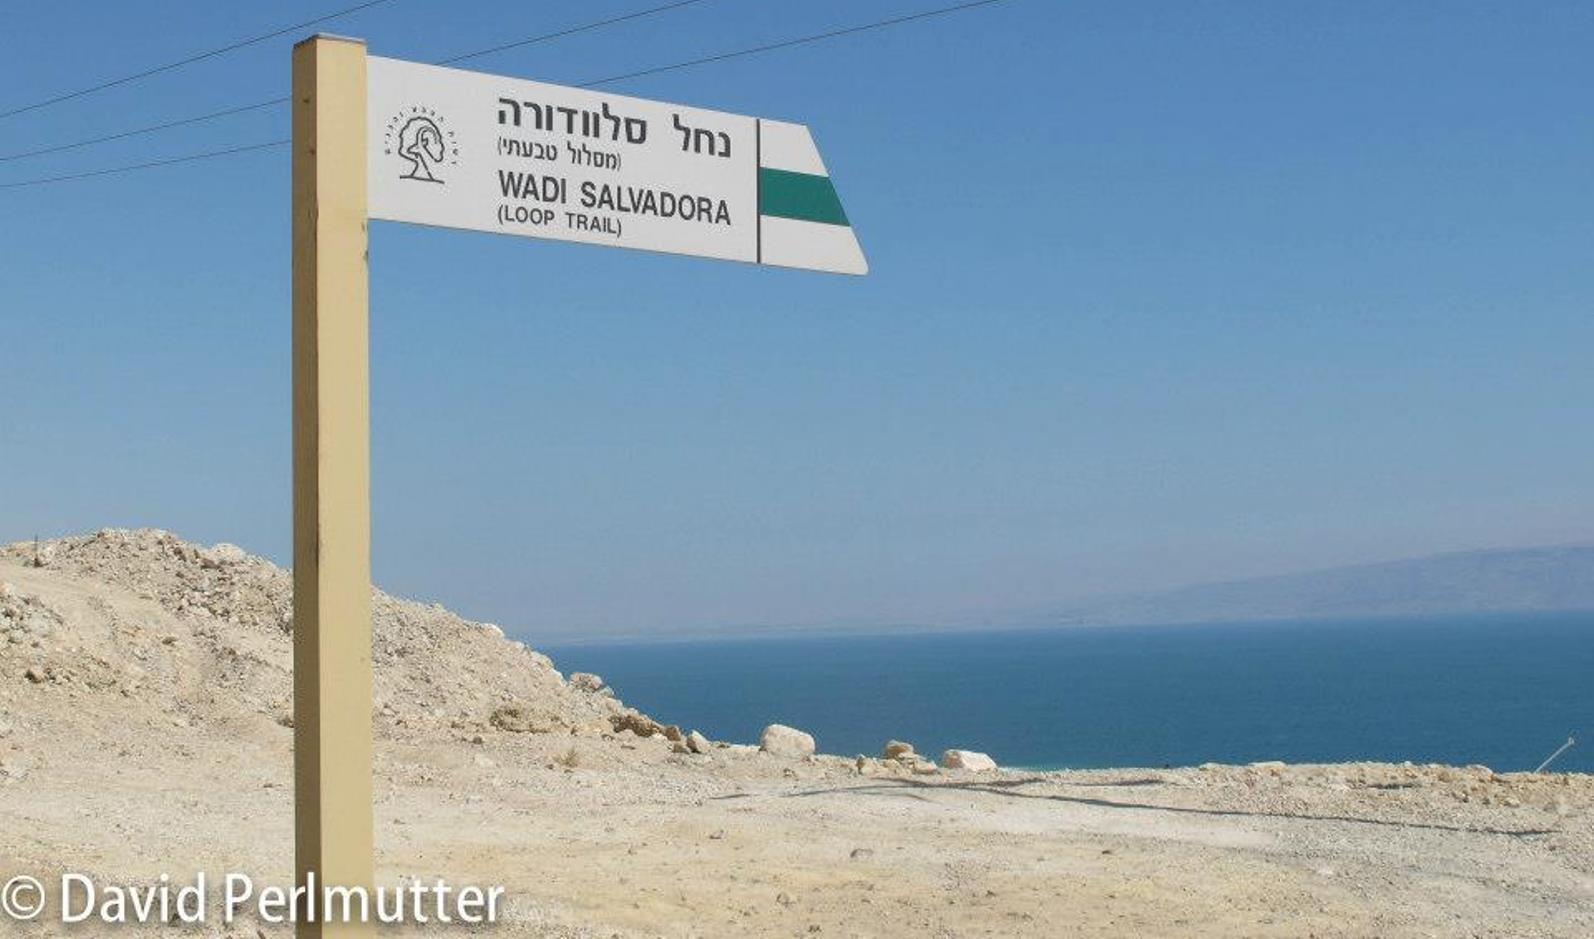 Photo by David Perlmutter/IsraelAdventure.com